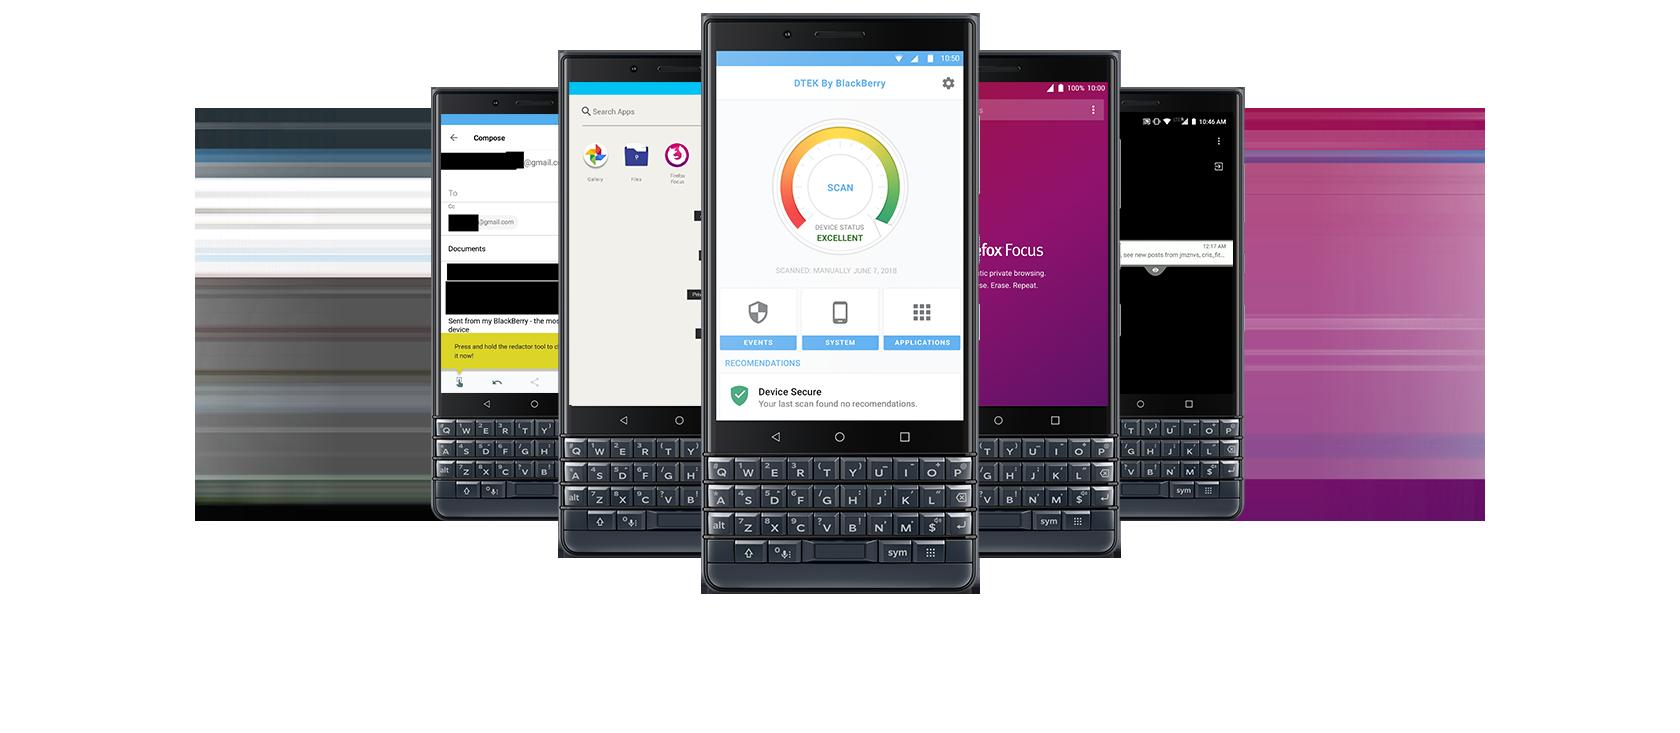 privacy blackberry key 2 le - BlackBerry KEY2 LE